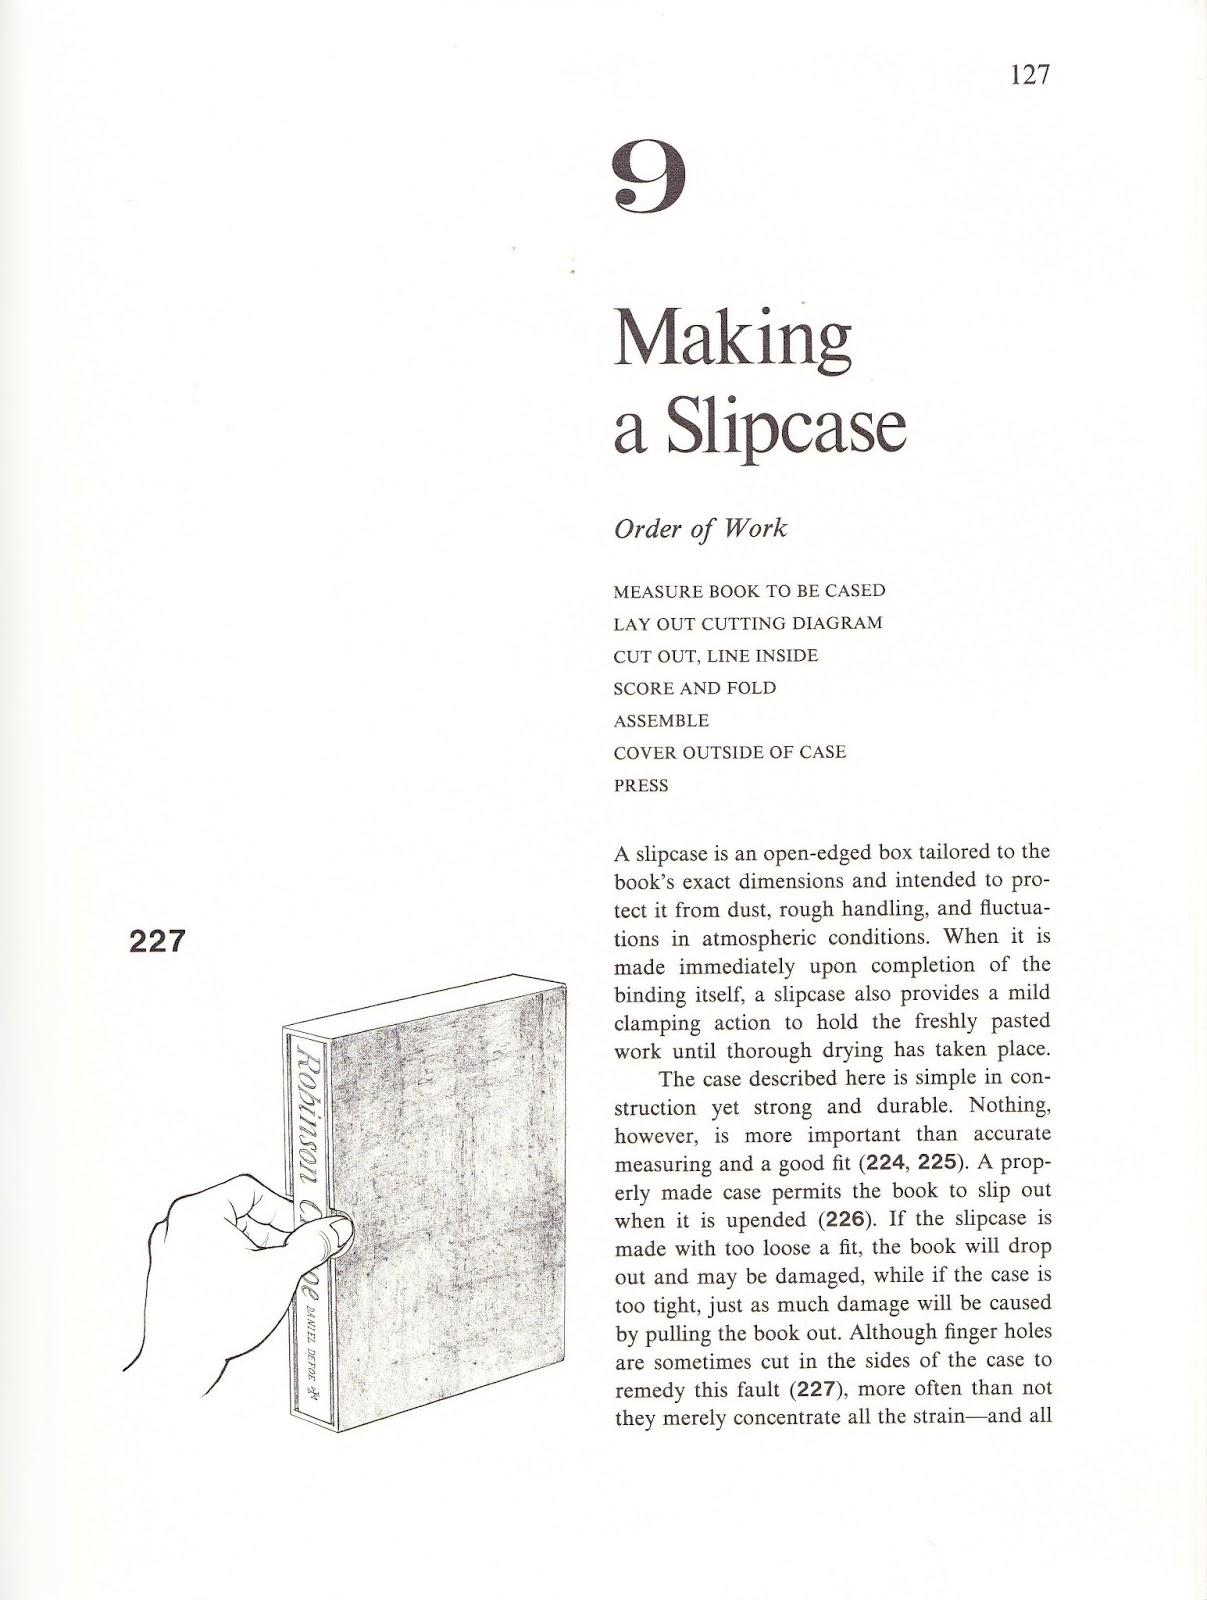 Watson, A.A. - Hand Bookbinding: A Manual of Instruction